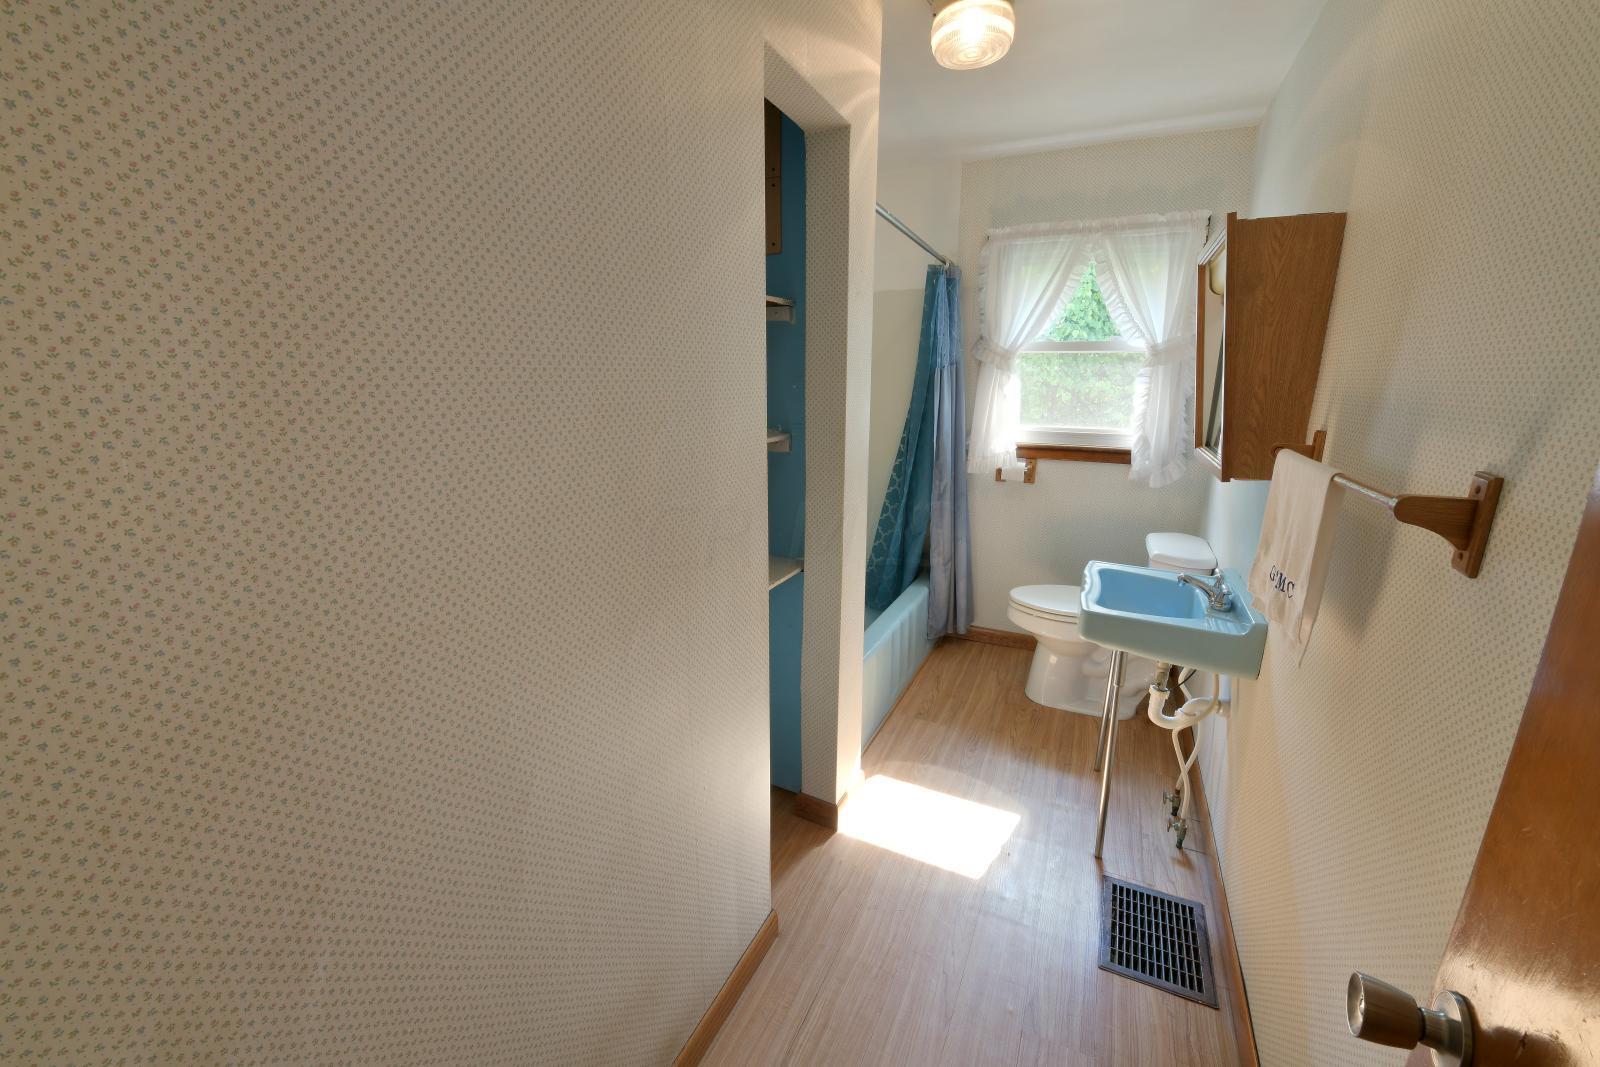 3719 Old Coopermill Rd - Full bath